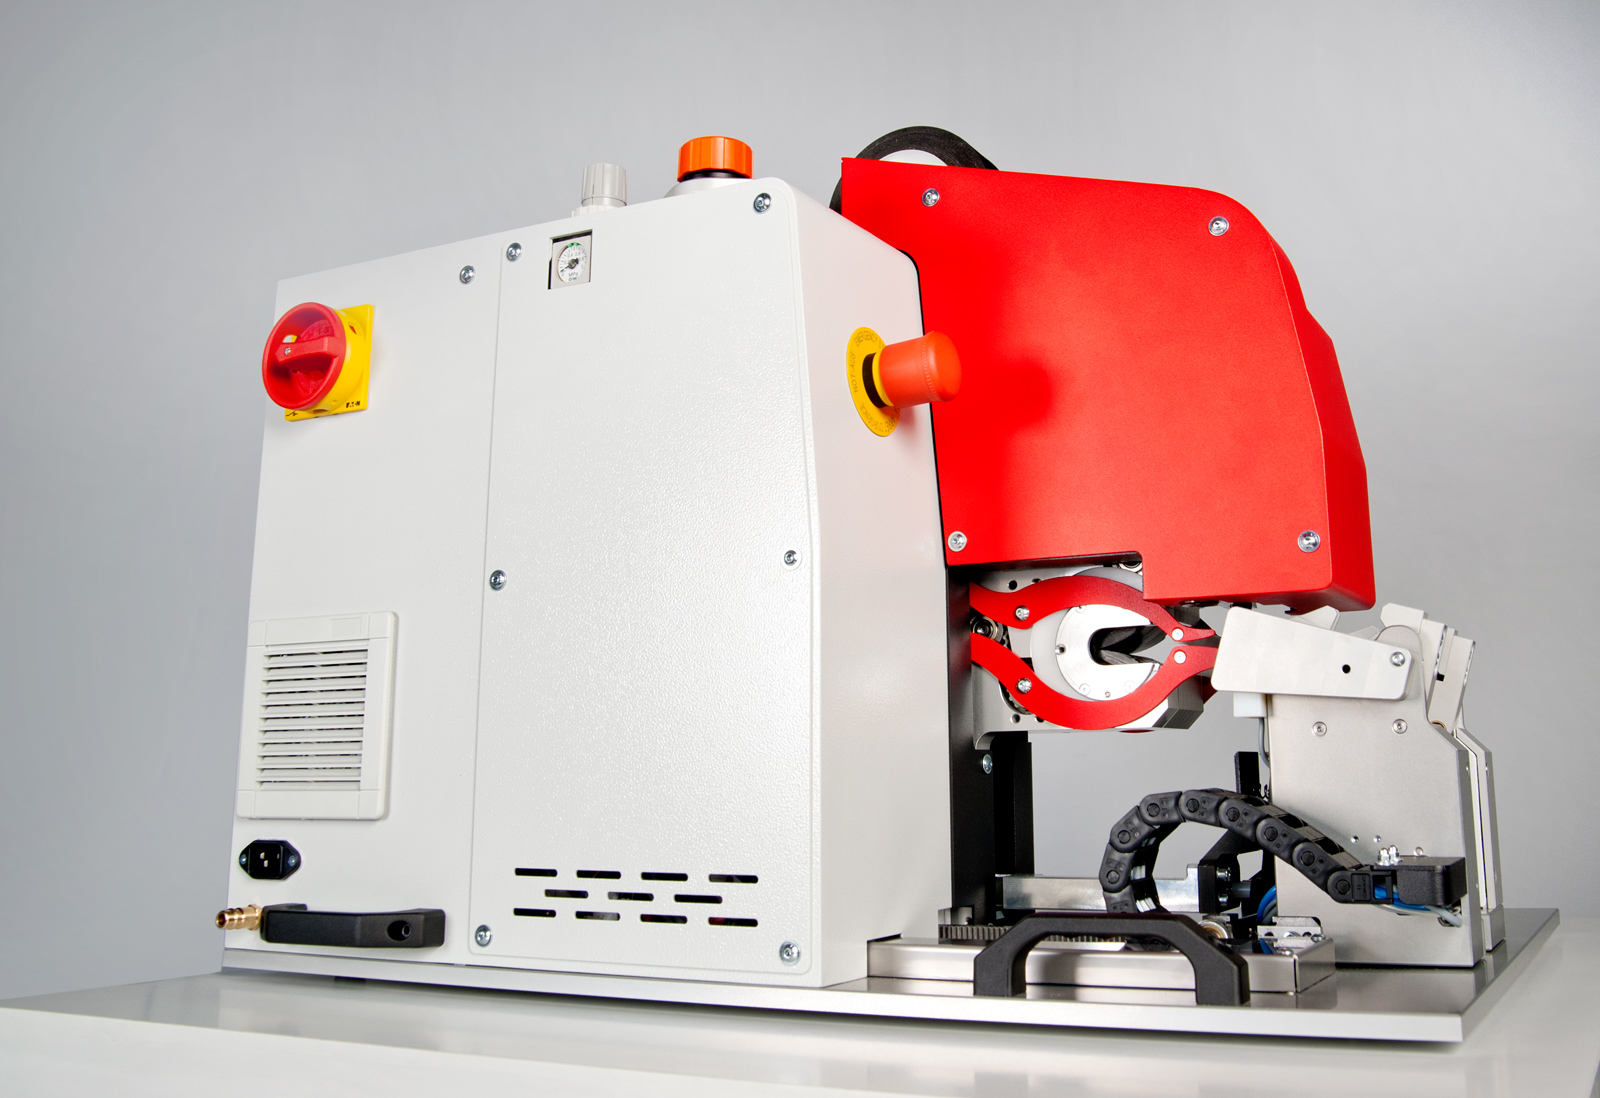 BM 50 - TechSpeed's spot taping machine